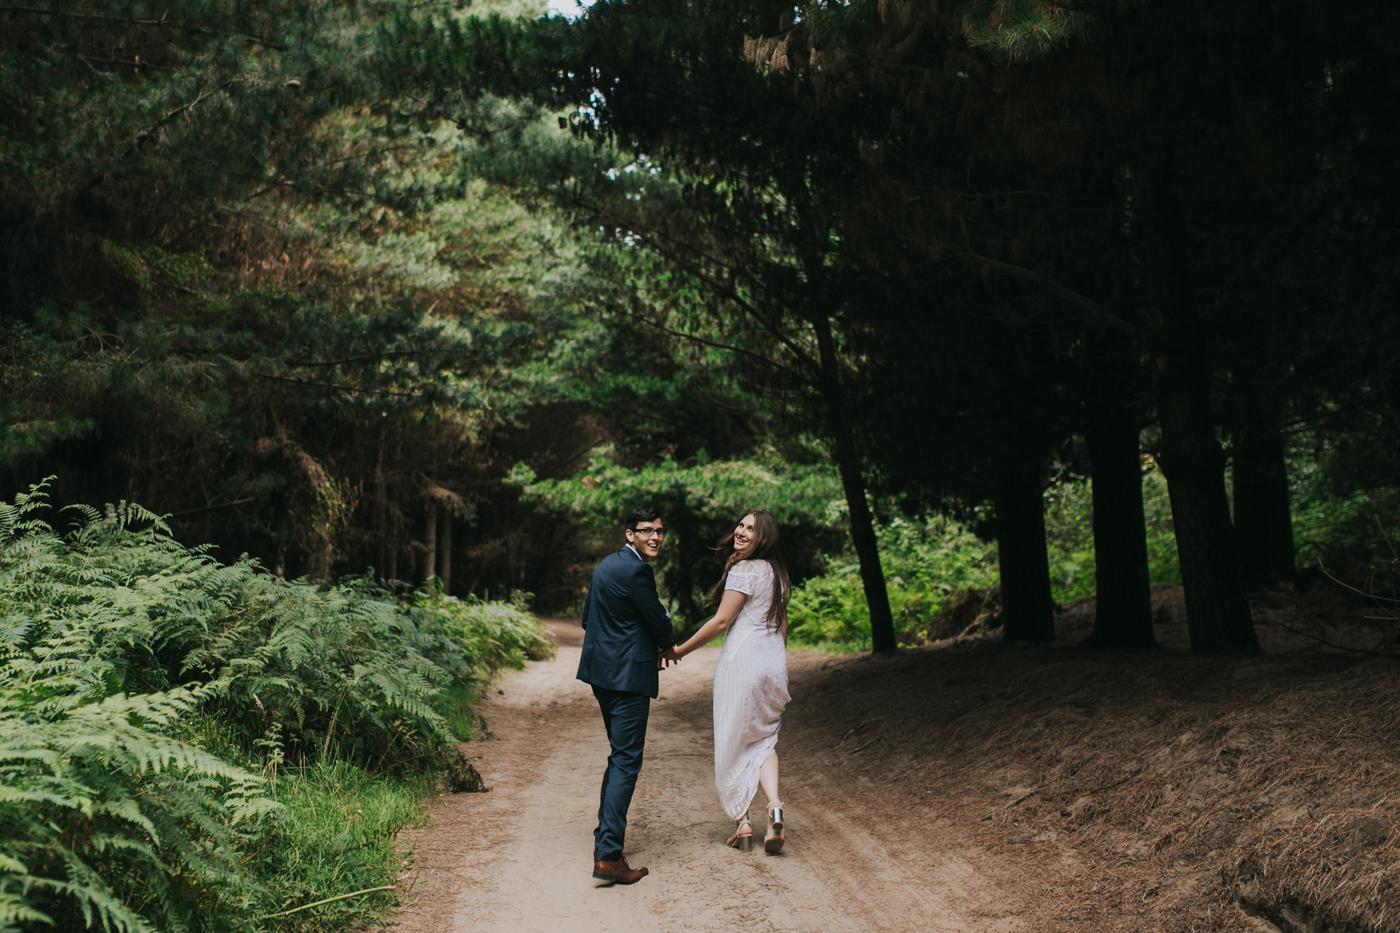 Ariana & Tim - Dunedin, New Zealand Wedding - Destination Wedding - Samantha Heather Photography-167.jpg